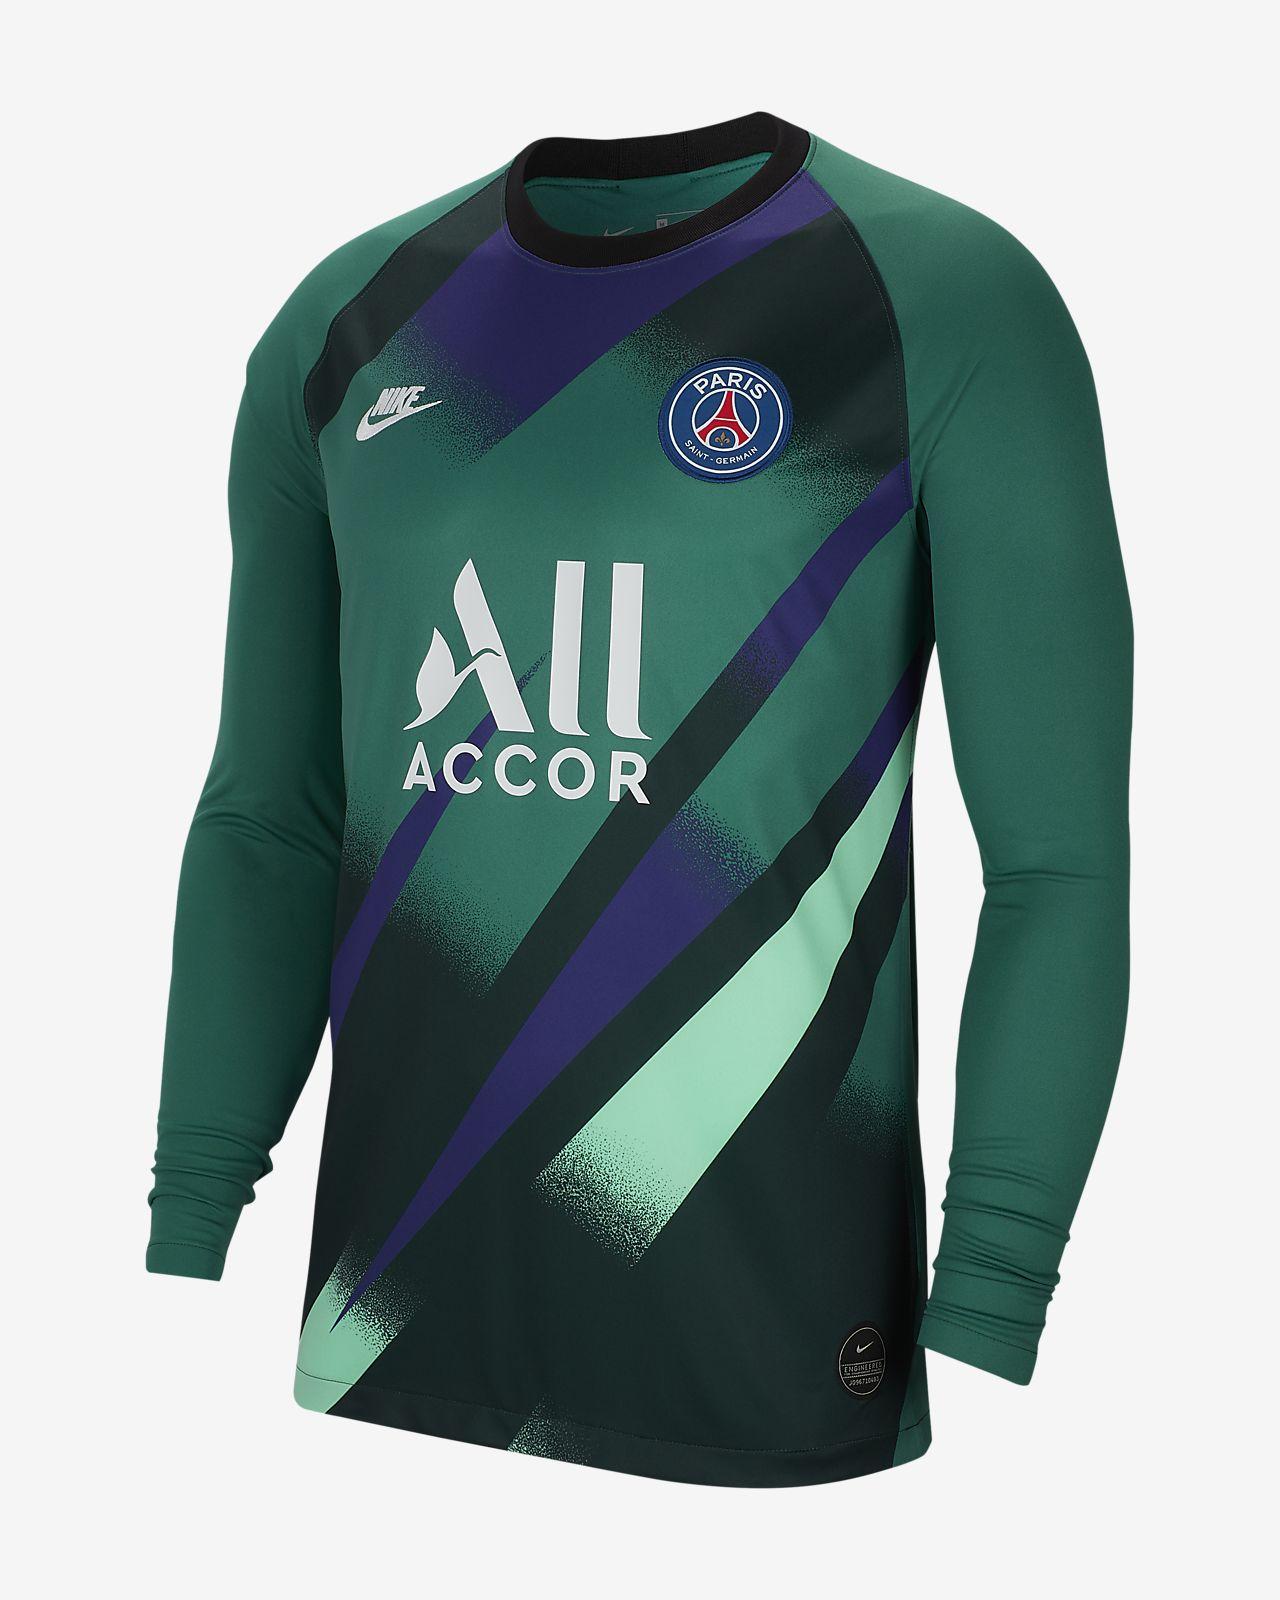 Paris Saint-Germain 2019/20 Stadium Third keeperdrakt til herre